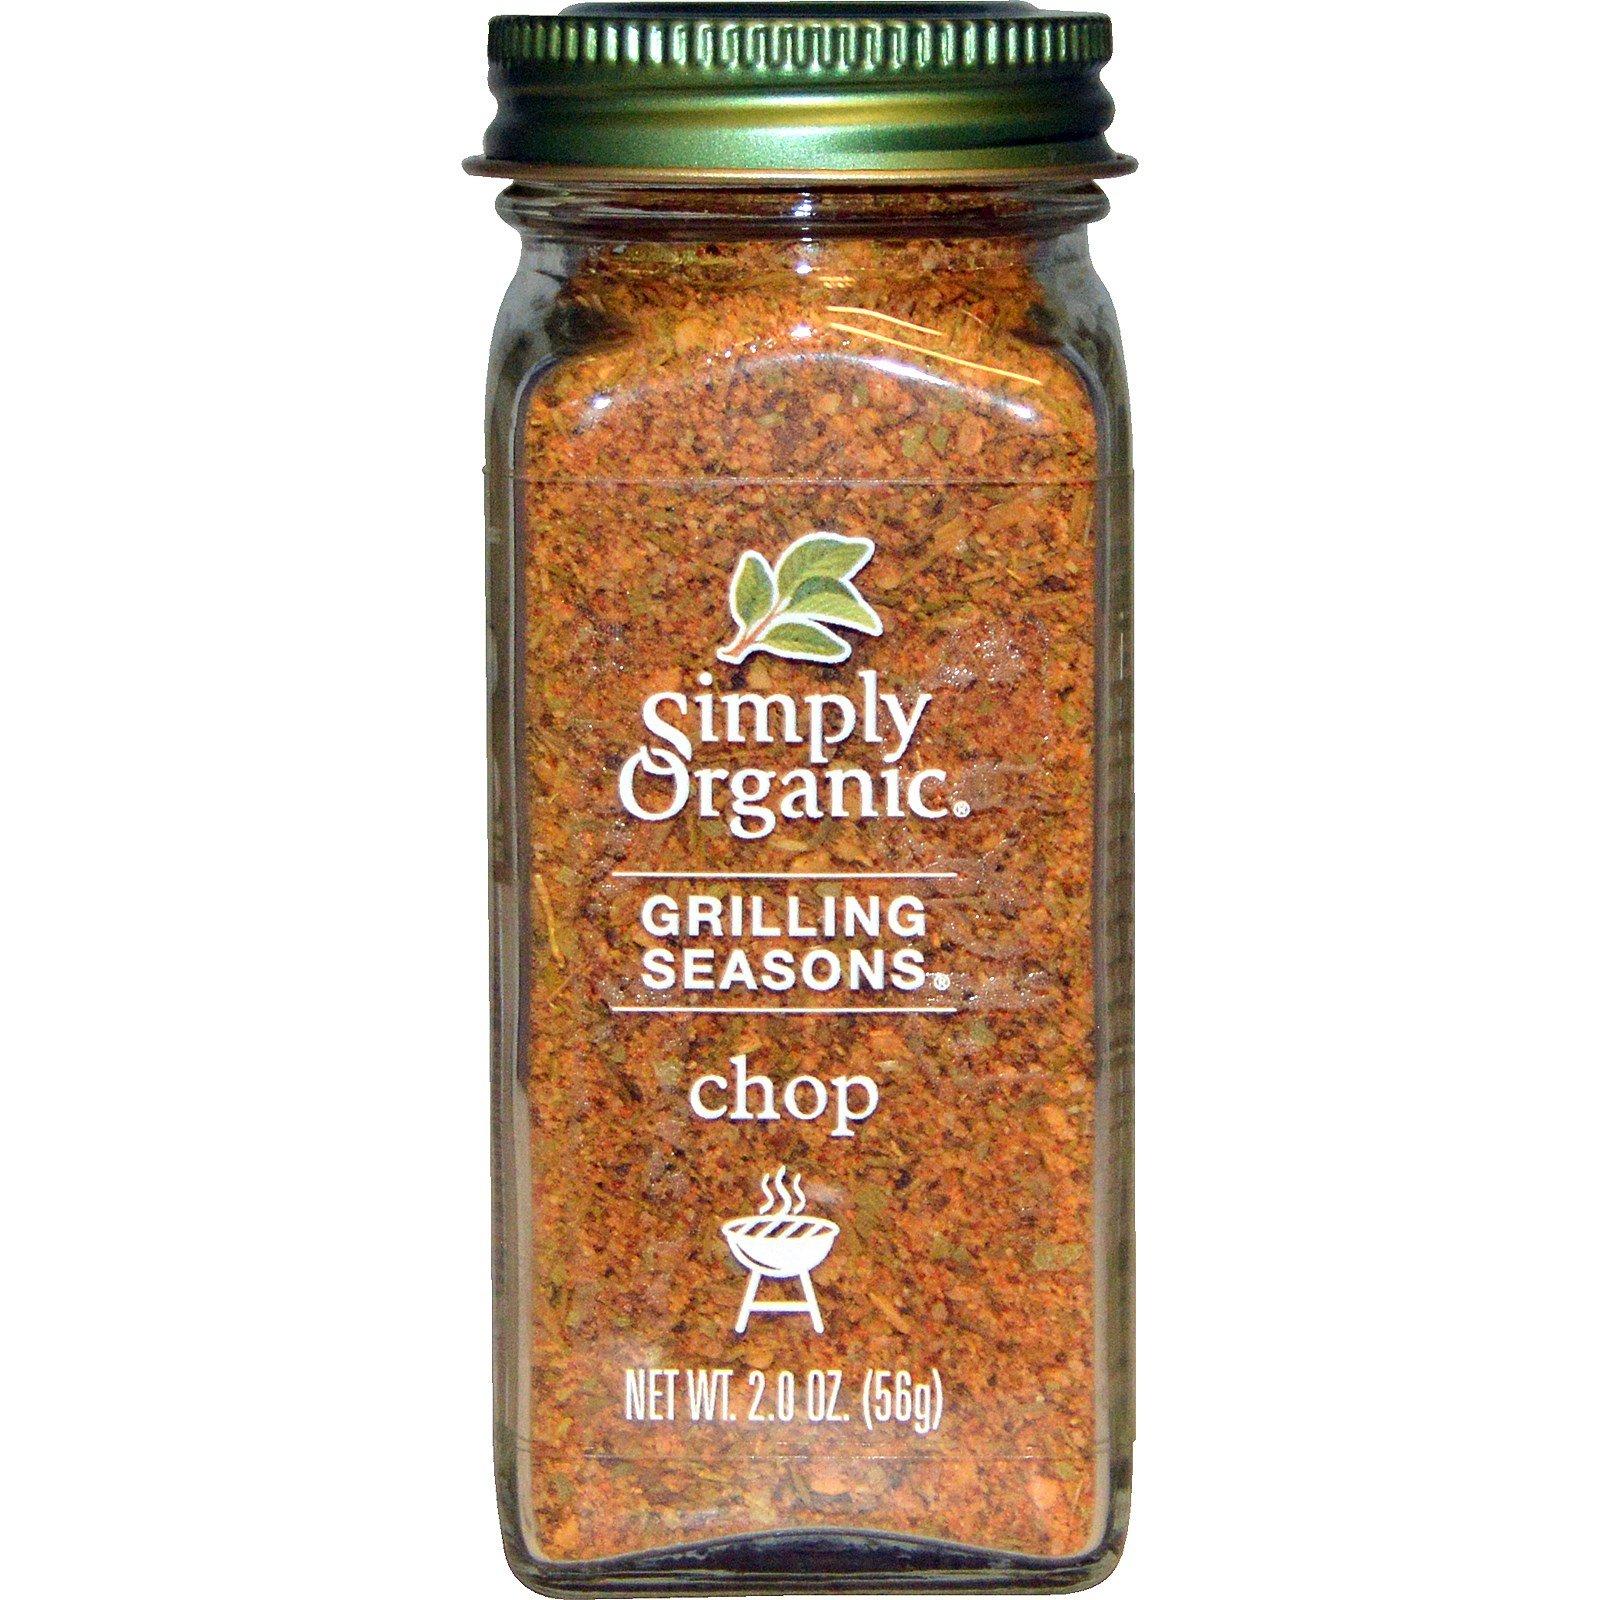 Simply Organic, Organic Grilling Seasons, Chop, 2.0 oz (56 g) Simply Organic, Organic Grilling Seasons, Chop, 2.0 oz (56 g) - 2pcs